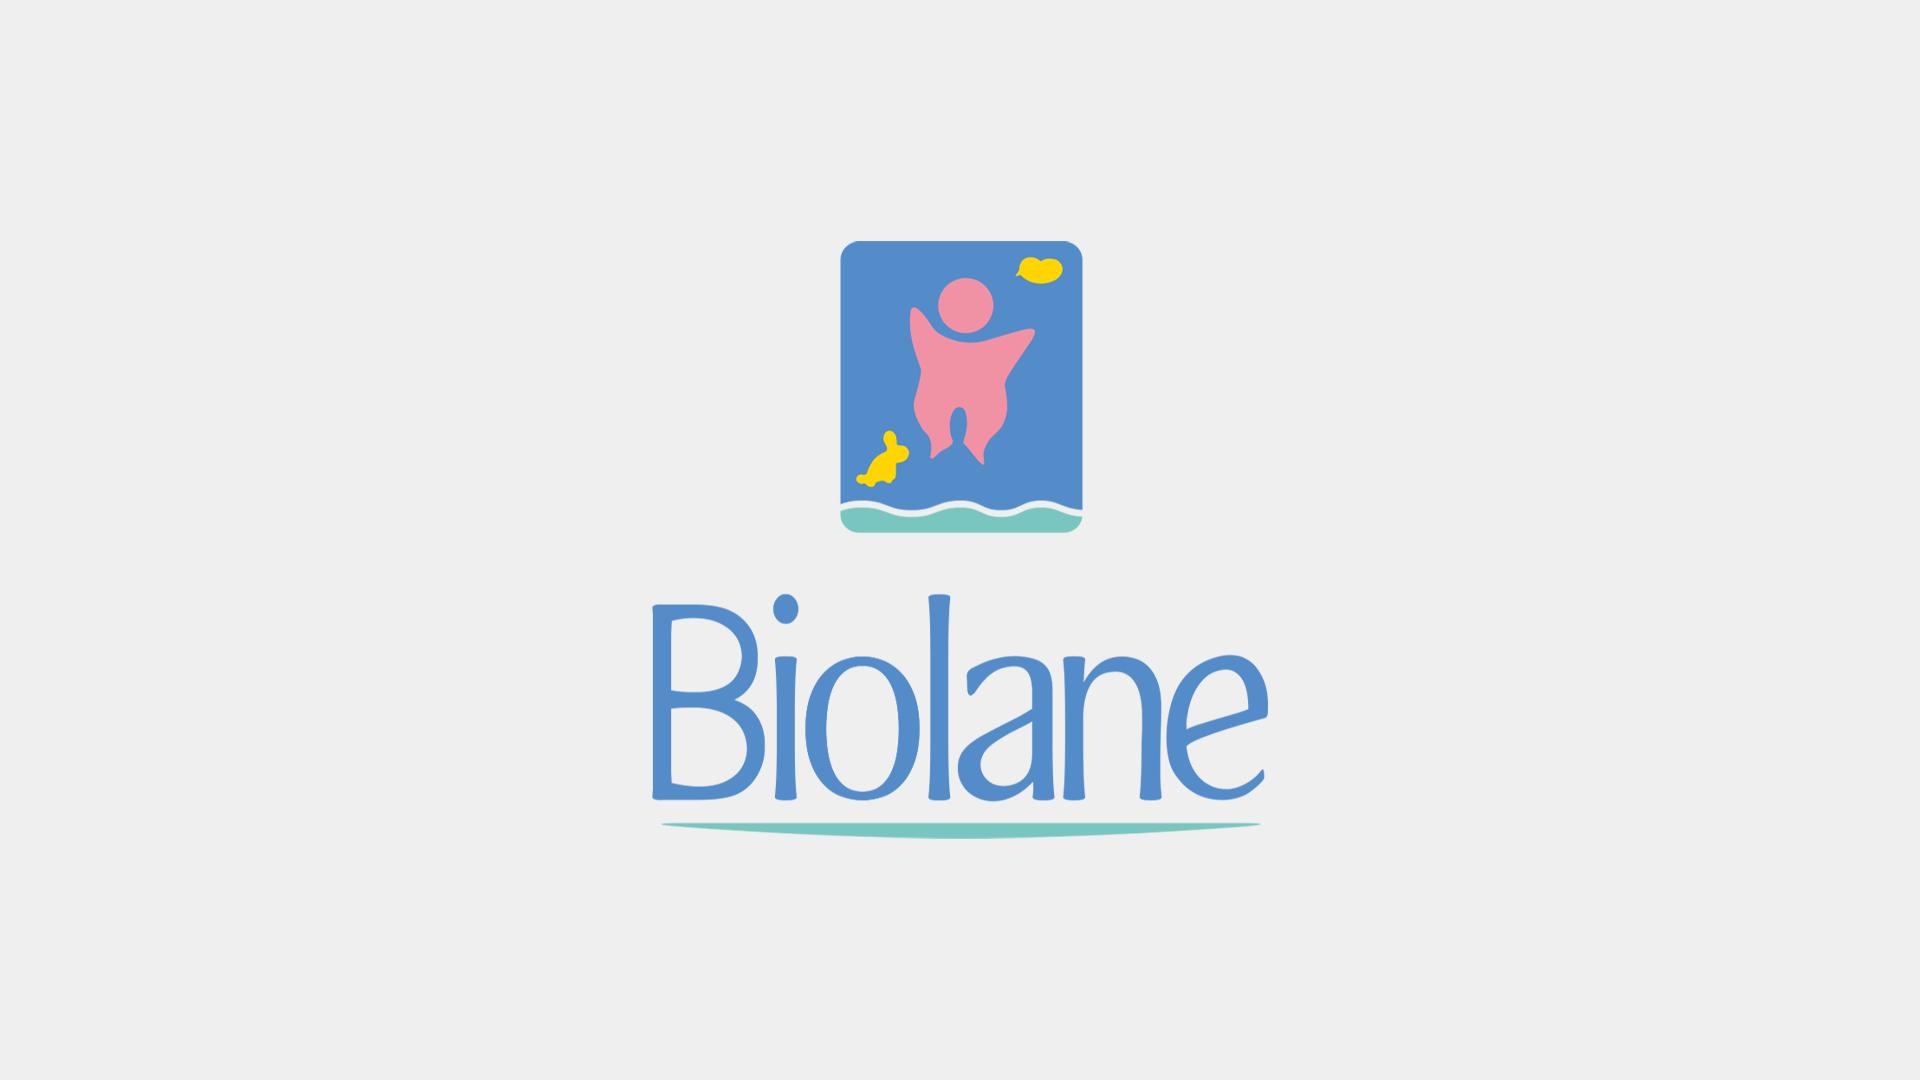 Biolane_1920x1080px